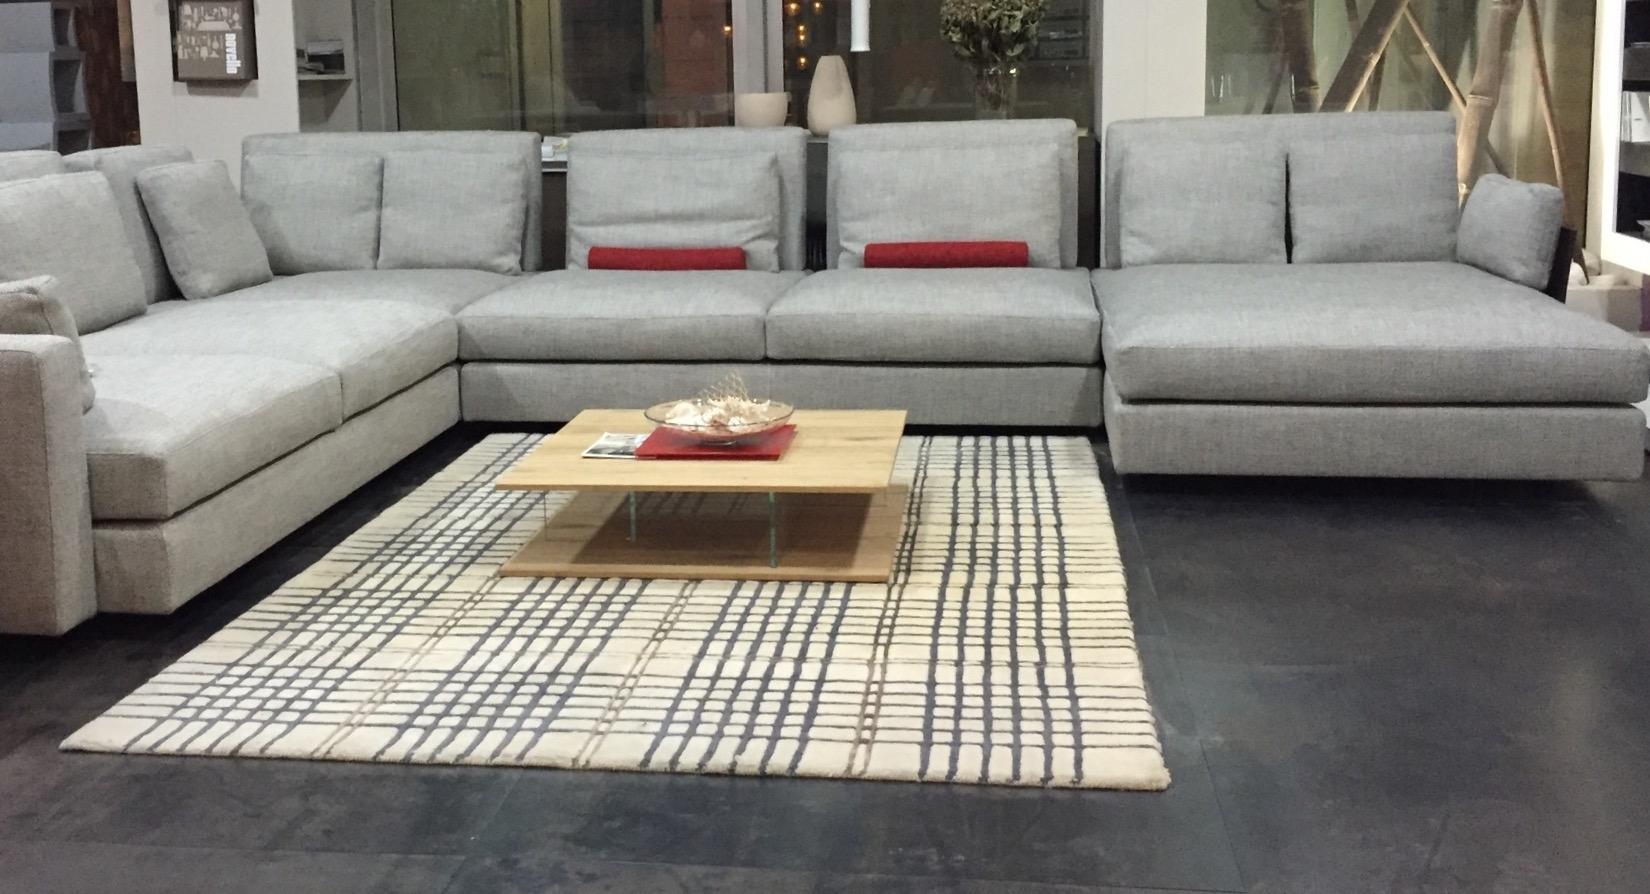 Divano swan hemingway divani lineari tessuto divano 4 for Divano 4 posti